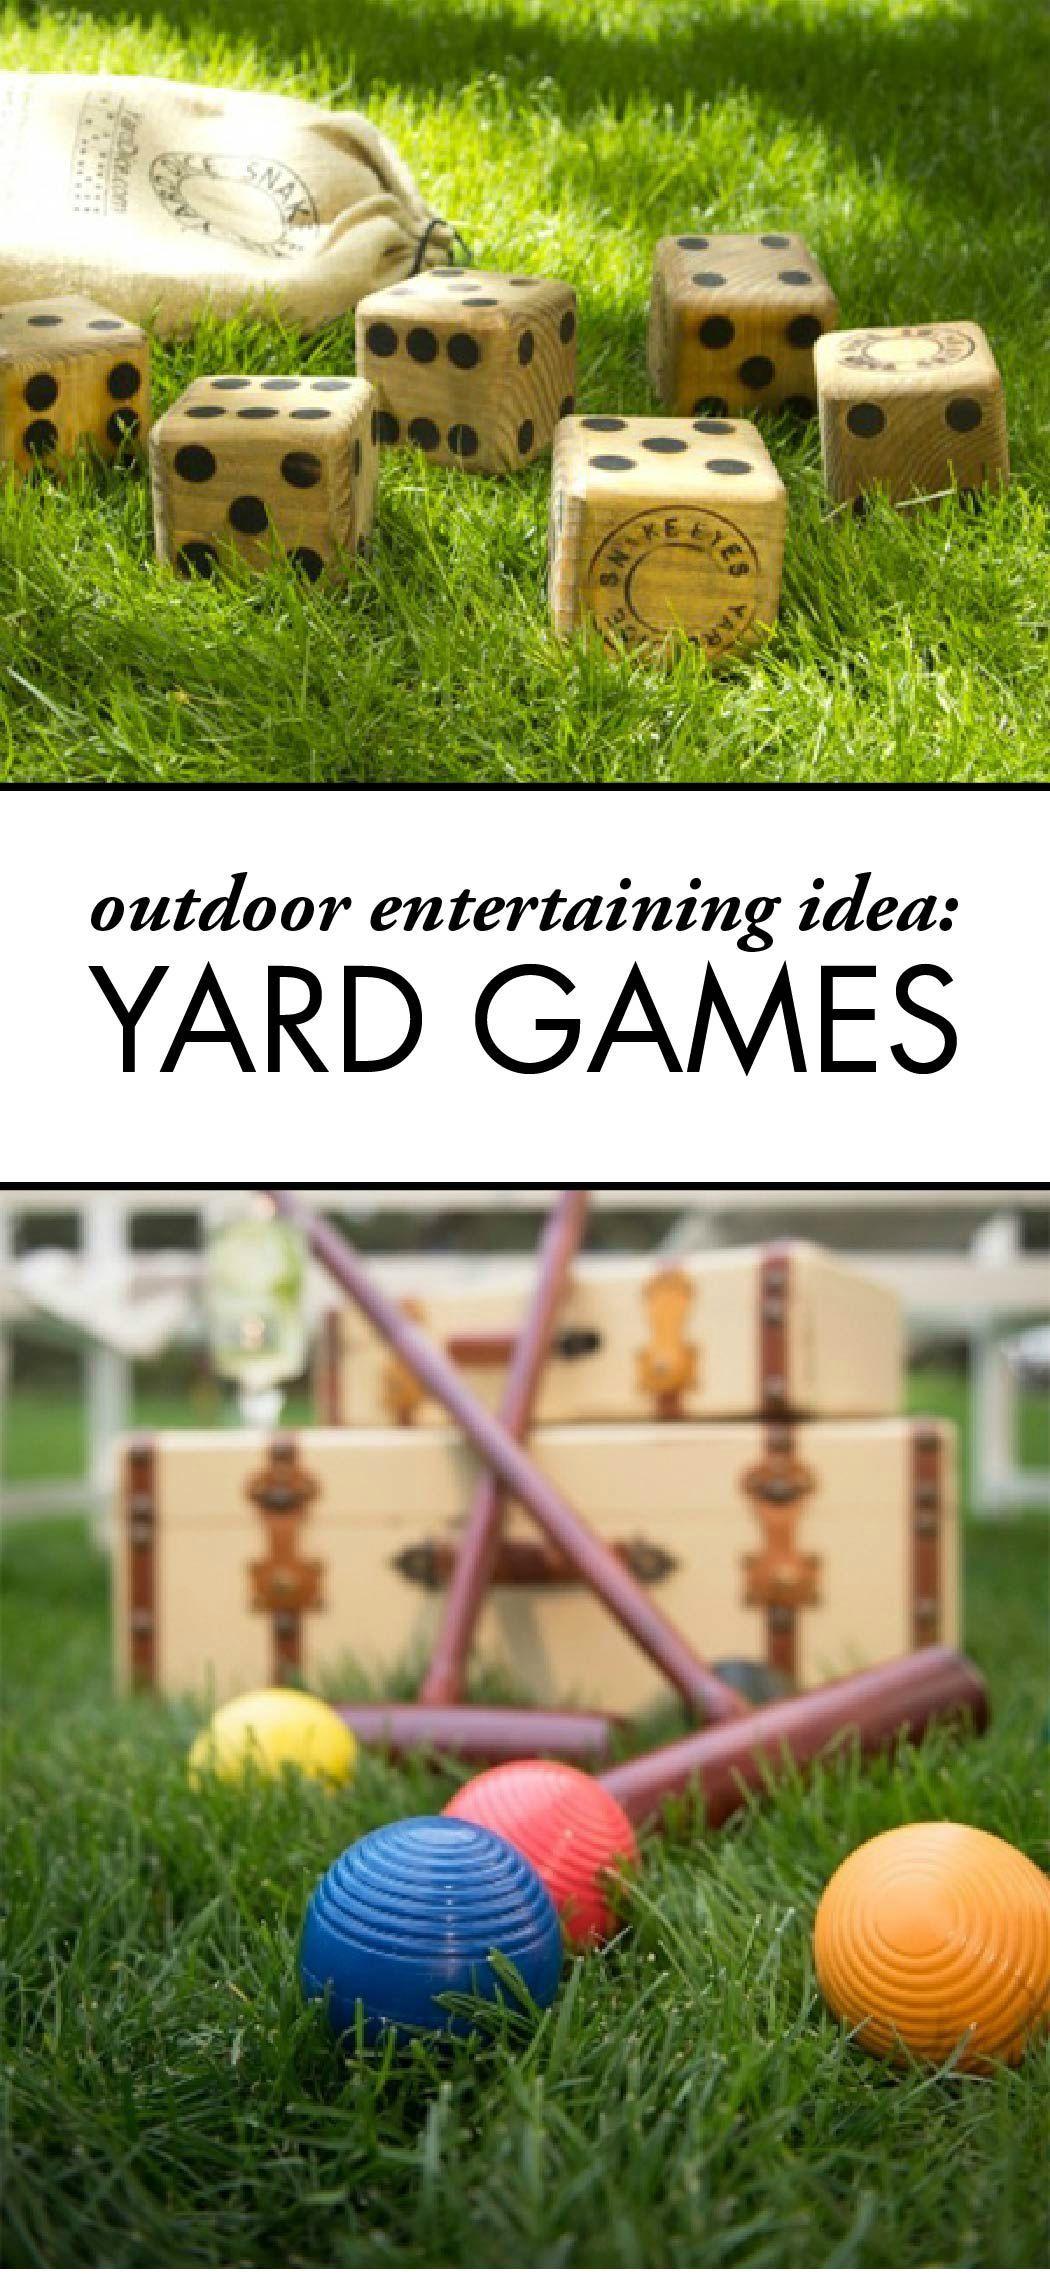 Yard Games to Play This Summer Yard games, Entertaining